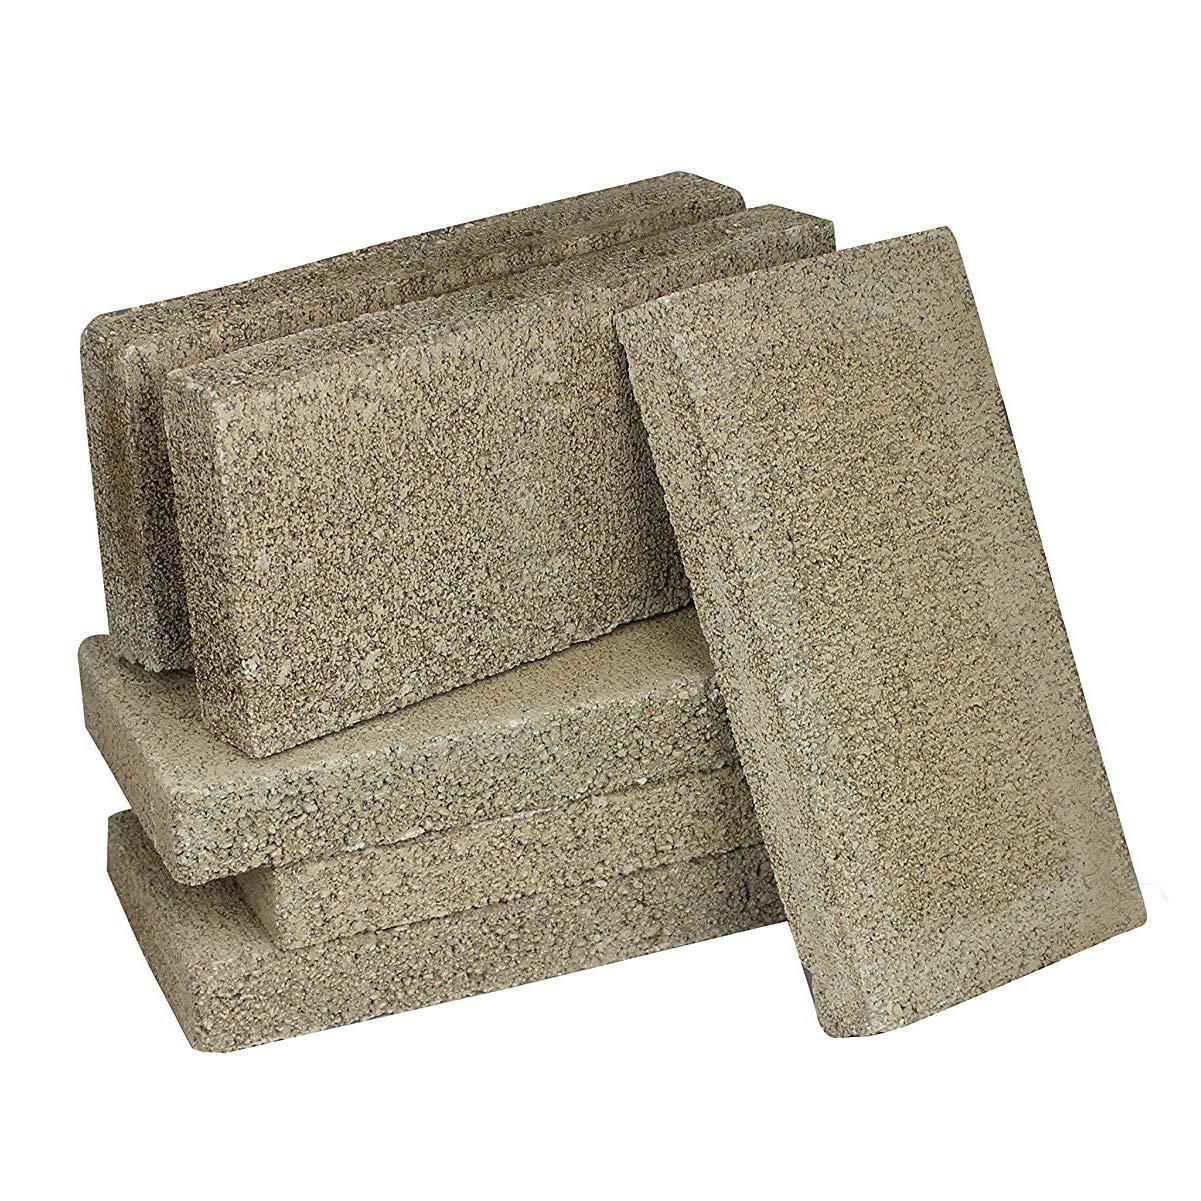 36 Pack US Stove FireBrick 4.5 x 9 x 1.25 Inch Wood Stove Ceramic Fire Bricks